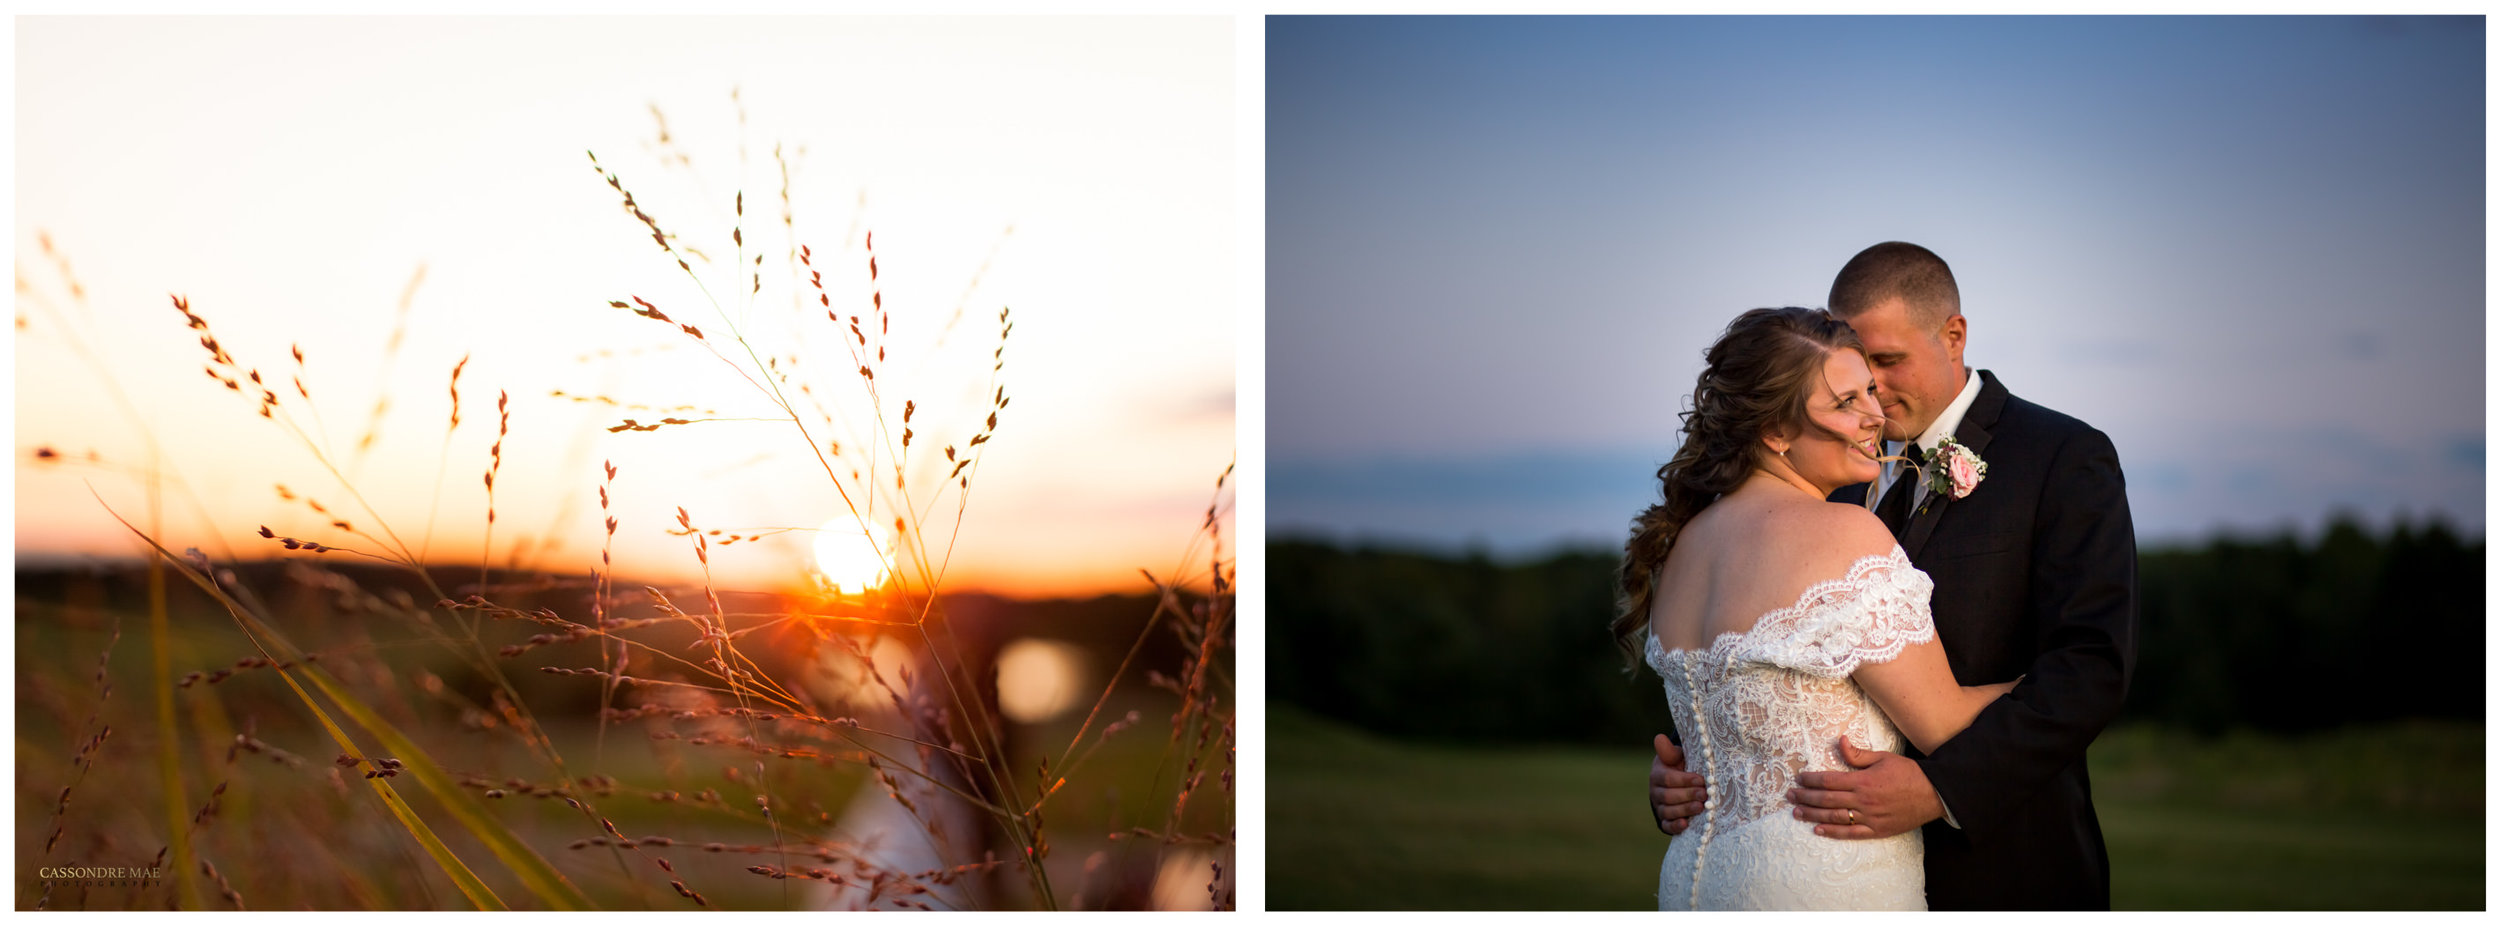 Cassondre Mae Photography Hudson Valley Wedding Photographer 1.jpg